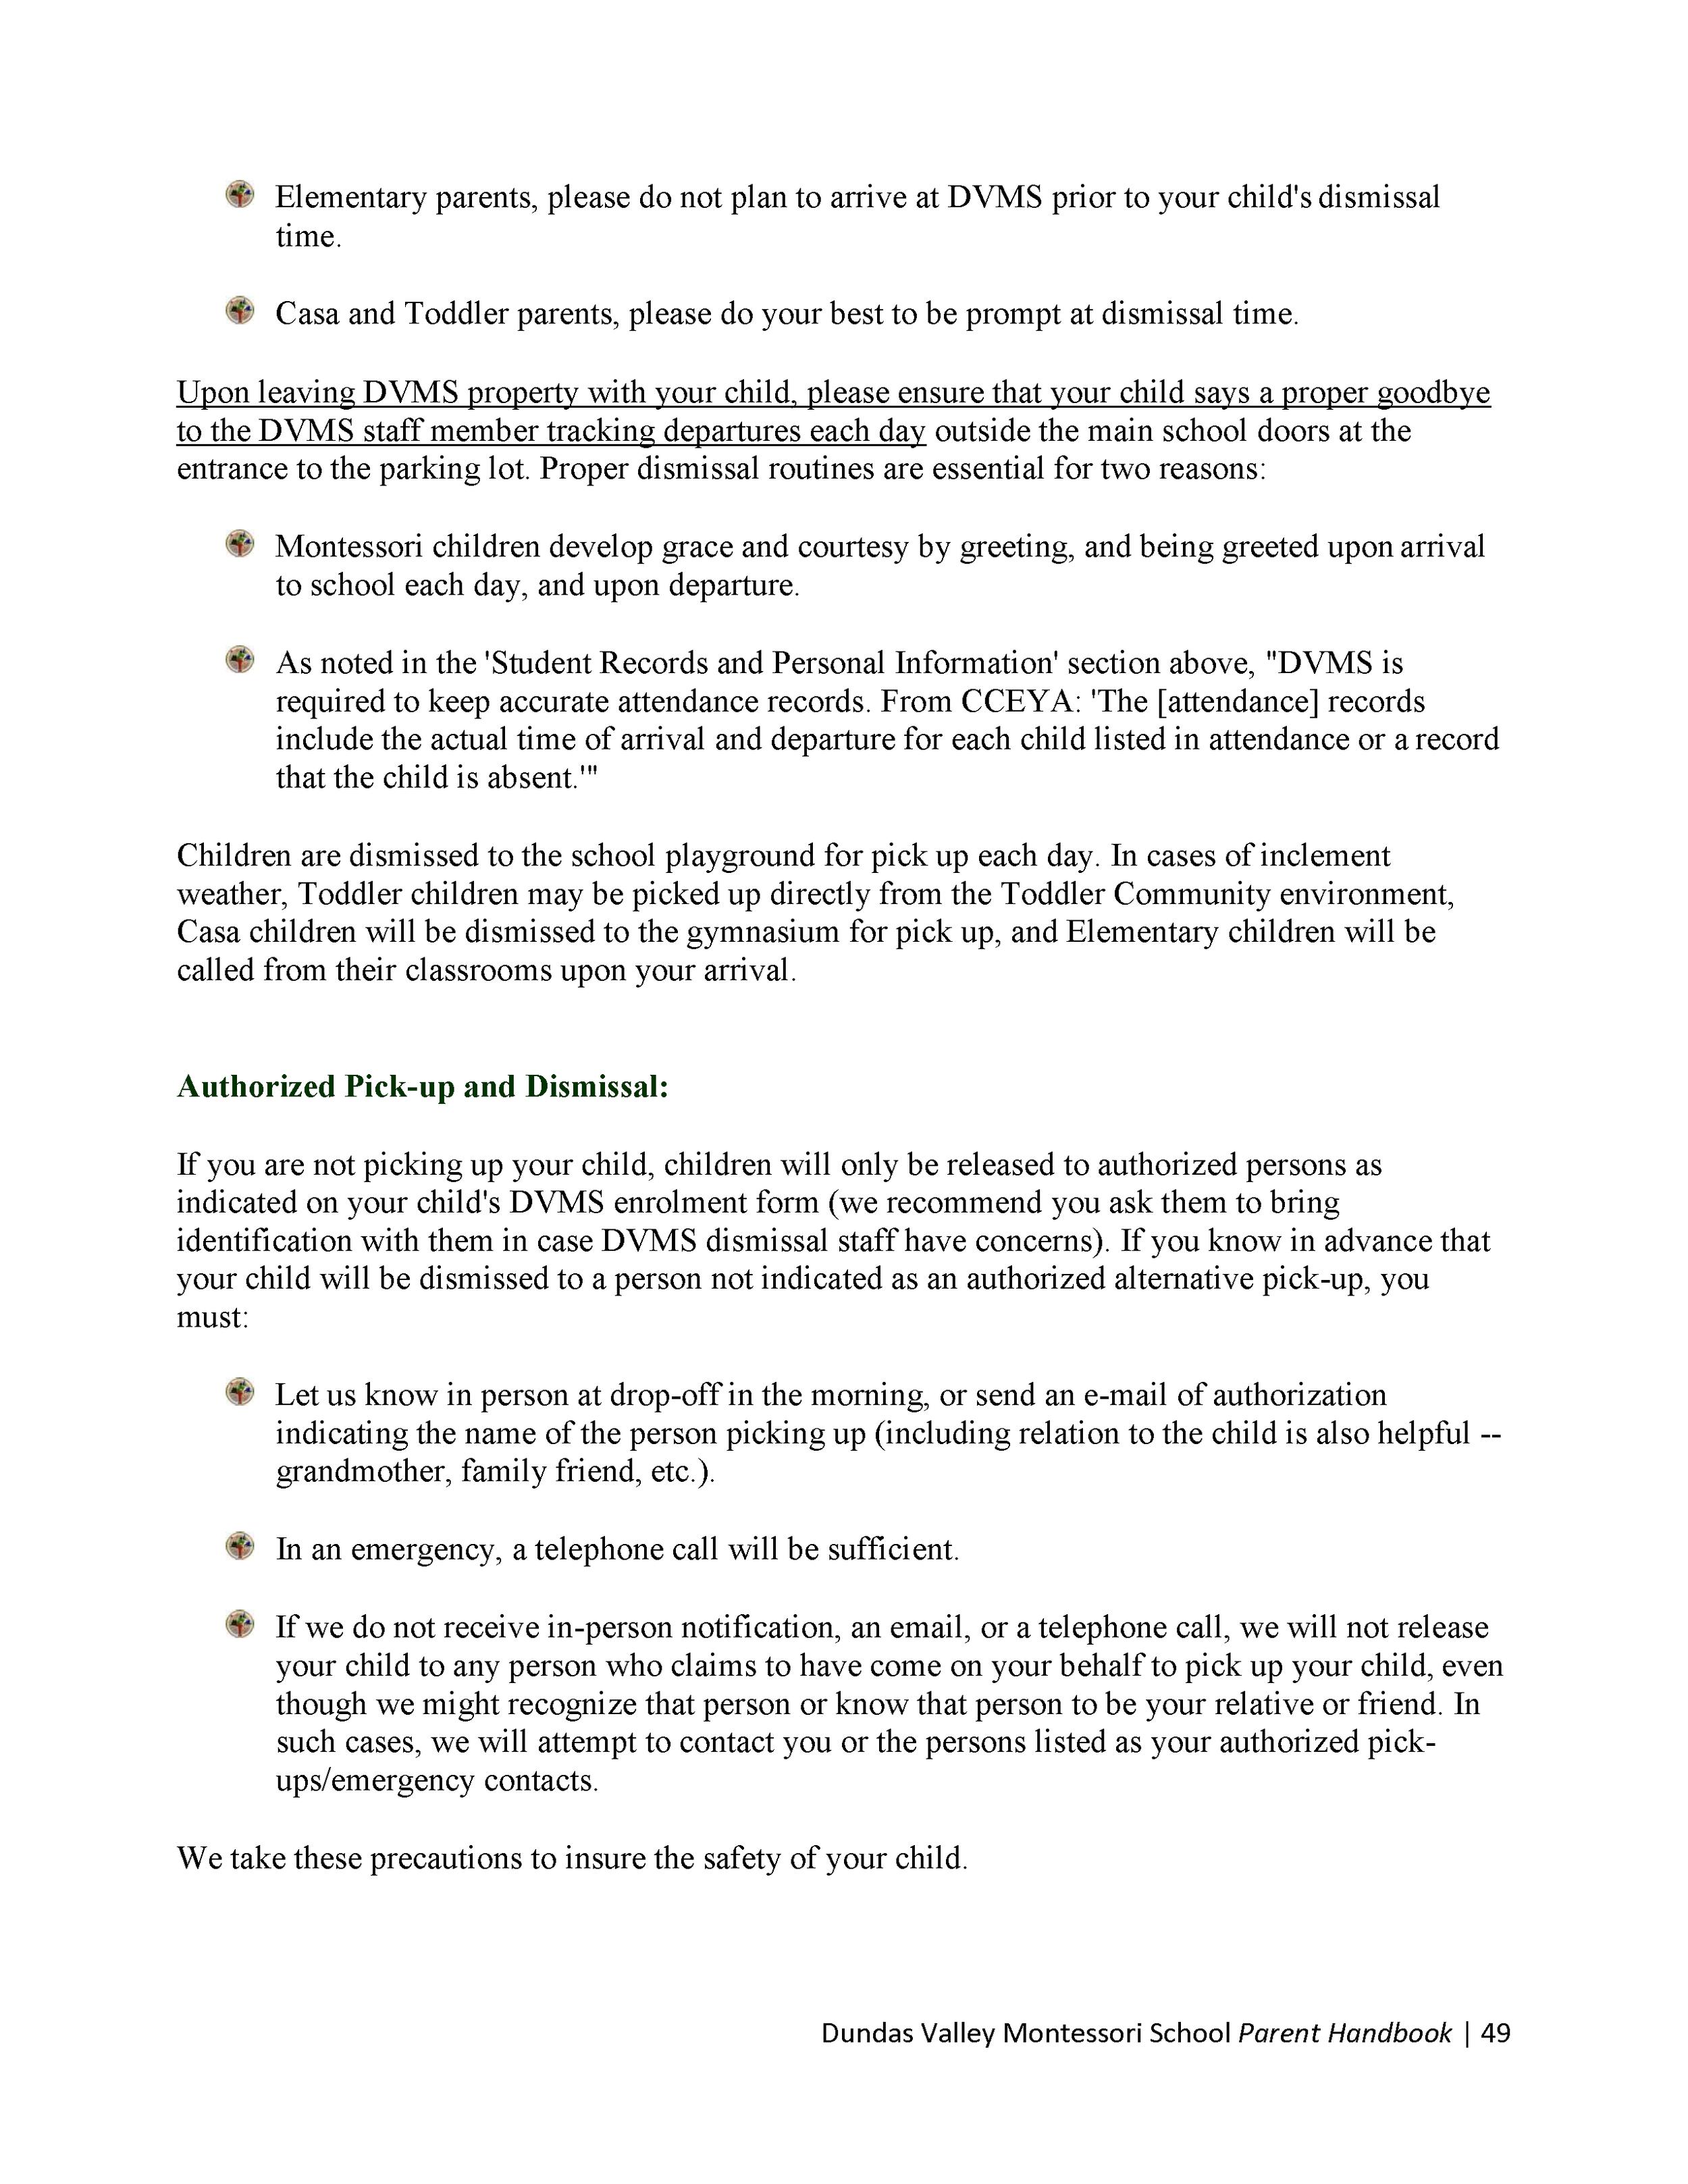 DVMS-Parent-Handbook-19-20_Page_051.png